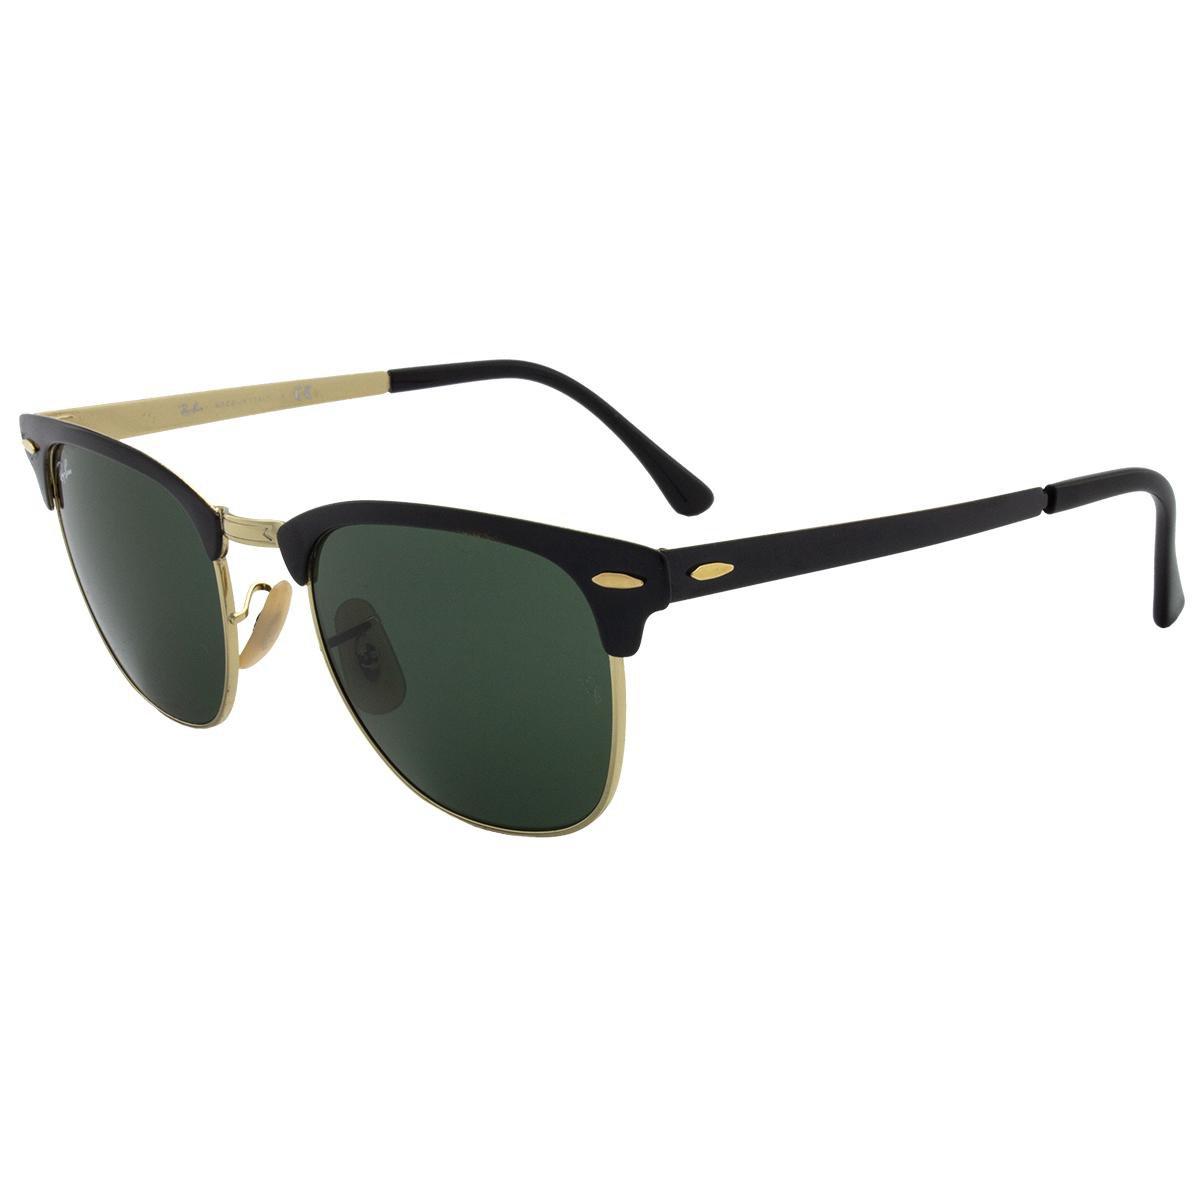 f9679e98b0f24 Óculos de Sol Ray-Ban Clubmaster Metal RB3716 - 187 51 - Compre ...